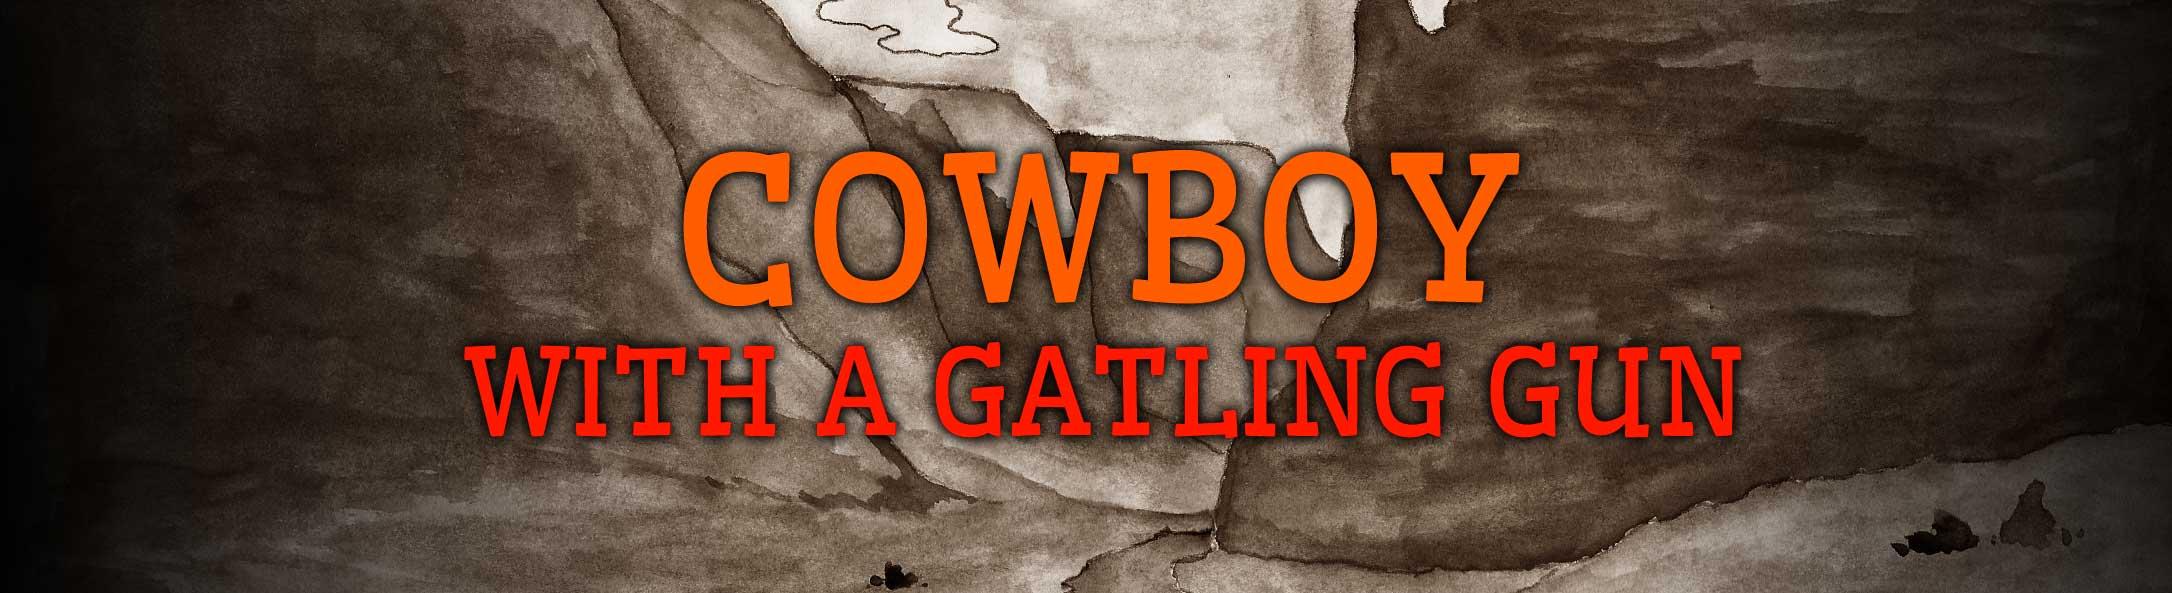 Cowboy with a Gatling Gun